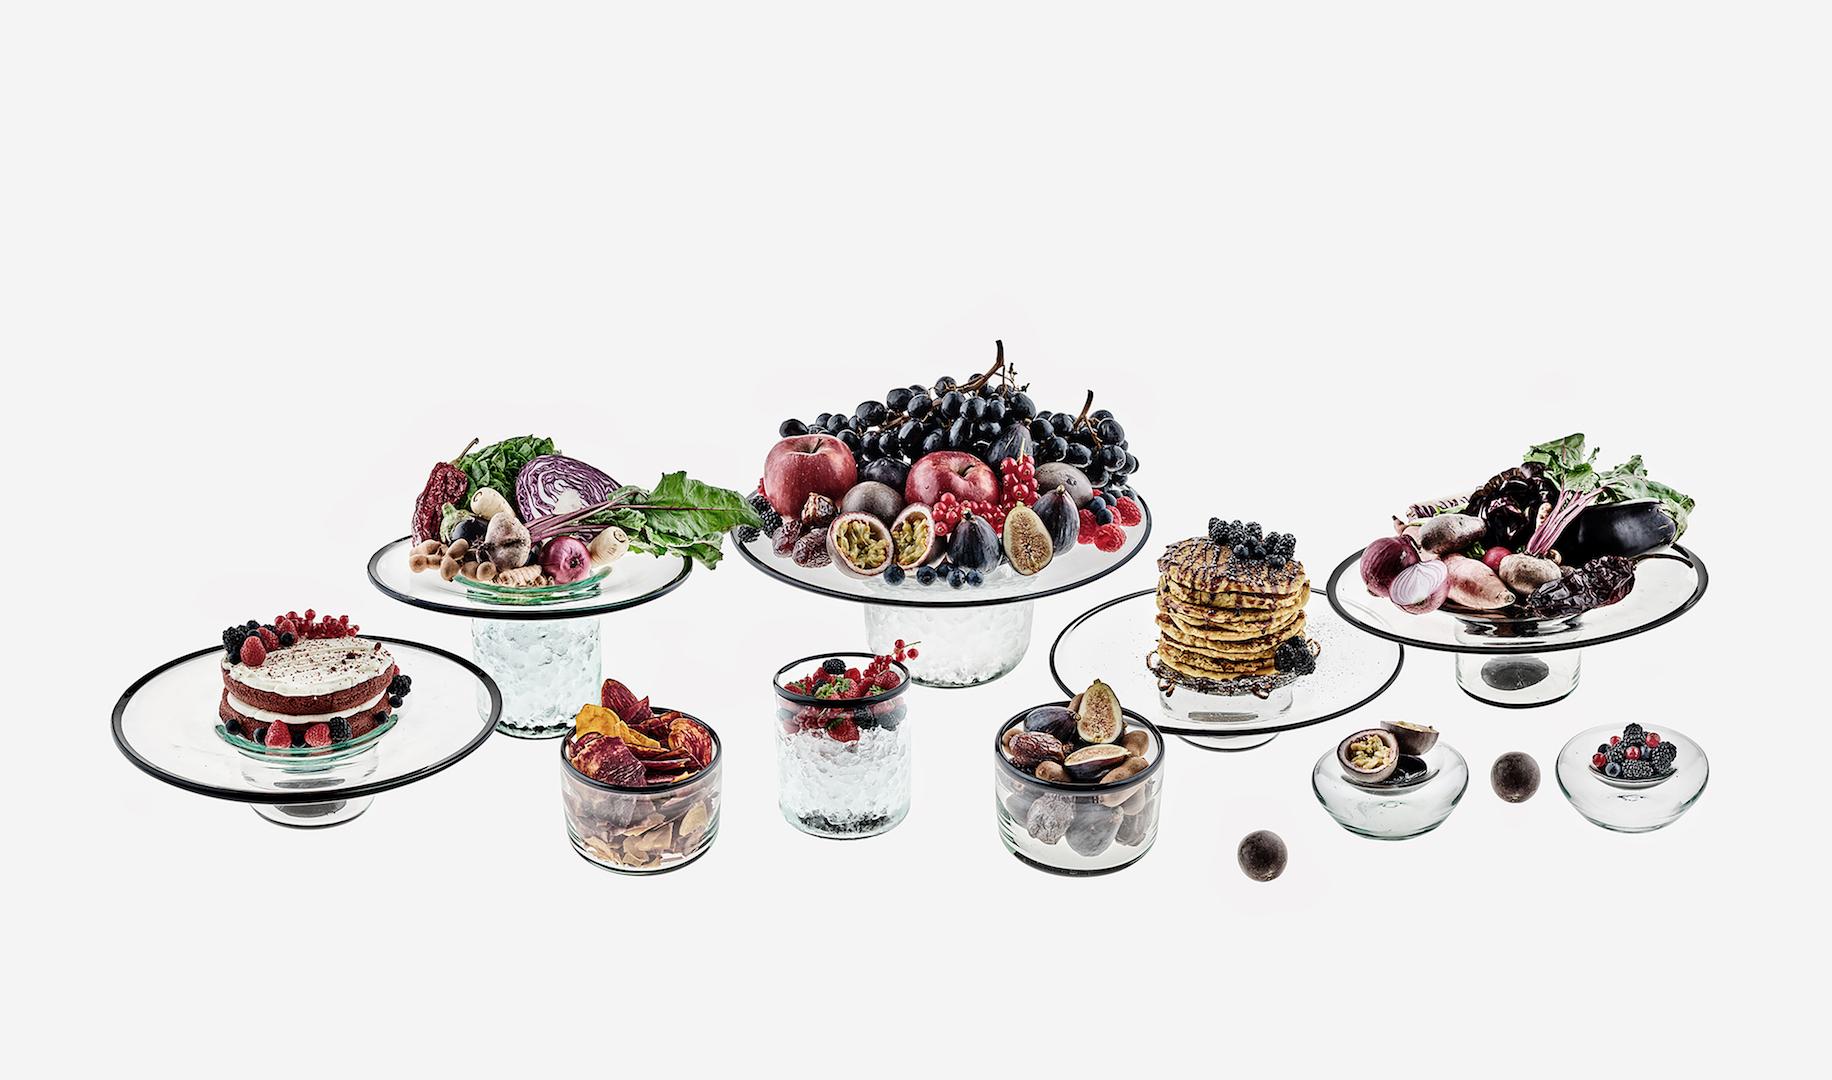 lafiore VIU web handmade - VIU Collection, buffet glas